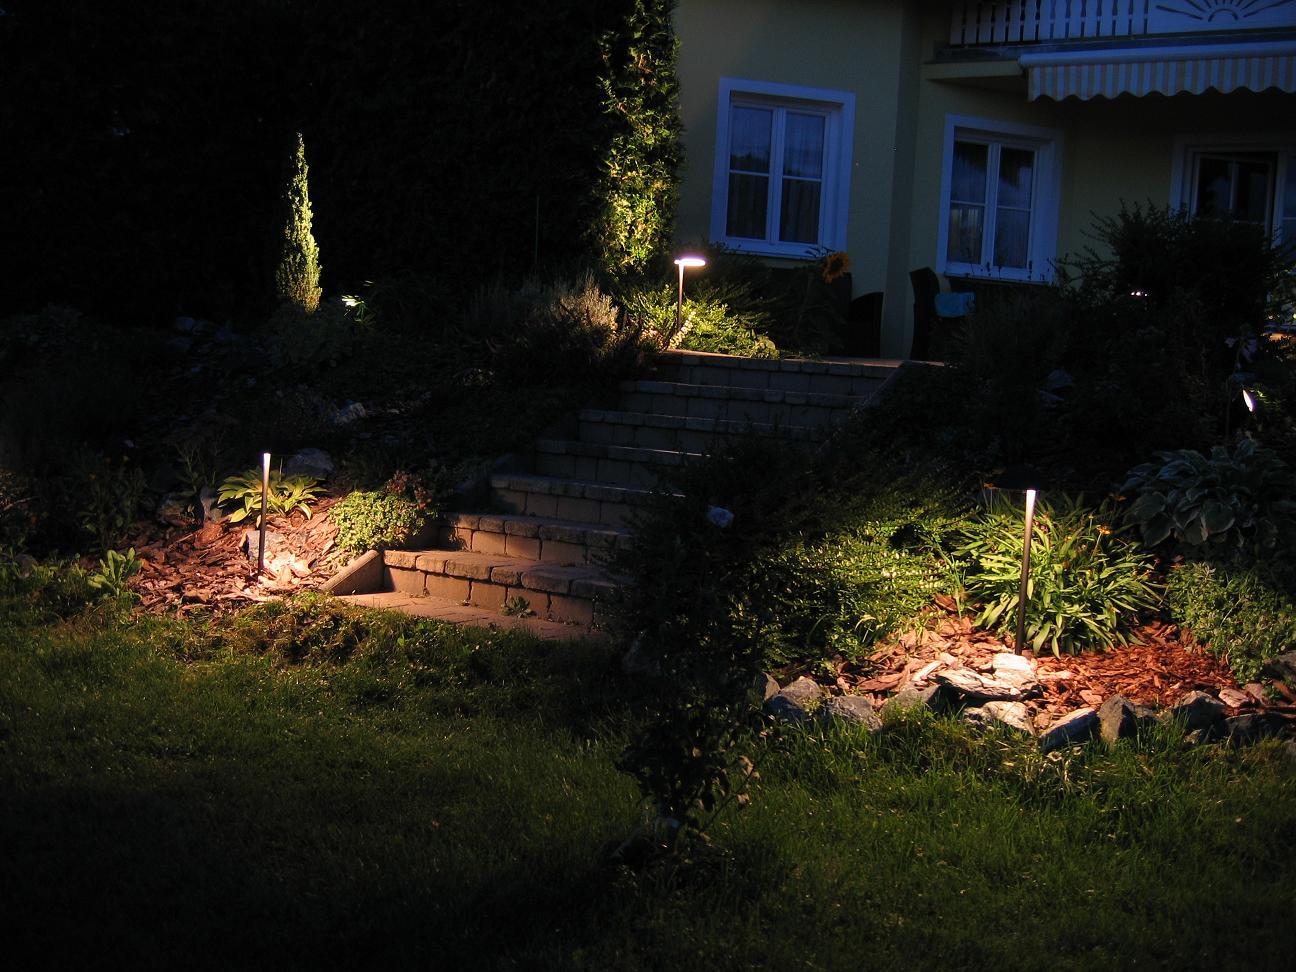 gartenbeleuchtung led gartenlicht und led gartenbeleuchtung au enbeleuchtung auch mit led. Black Bedroom Furniture Sets. Home Design Ideas